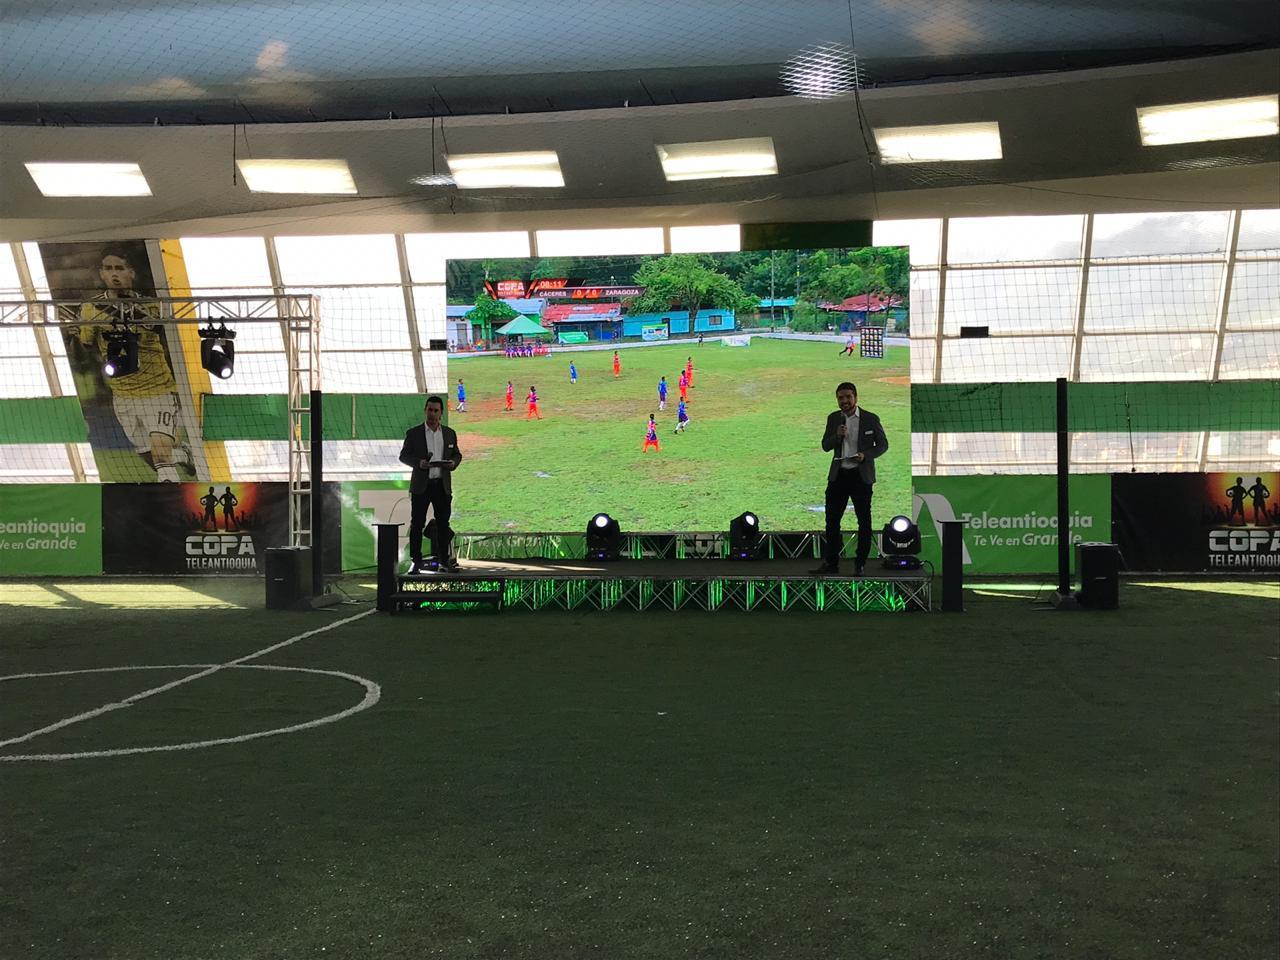 Juramento de la Copa Teleantioquia